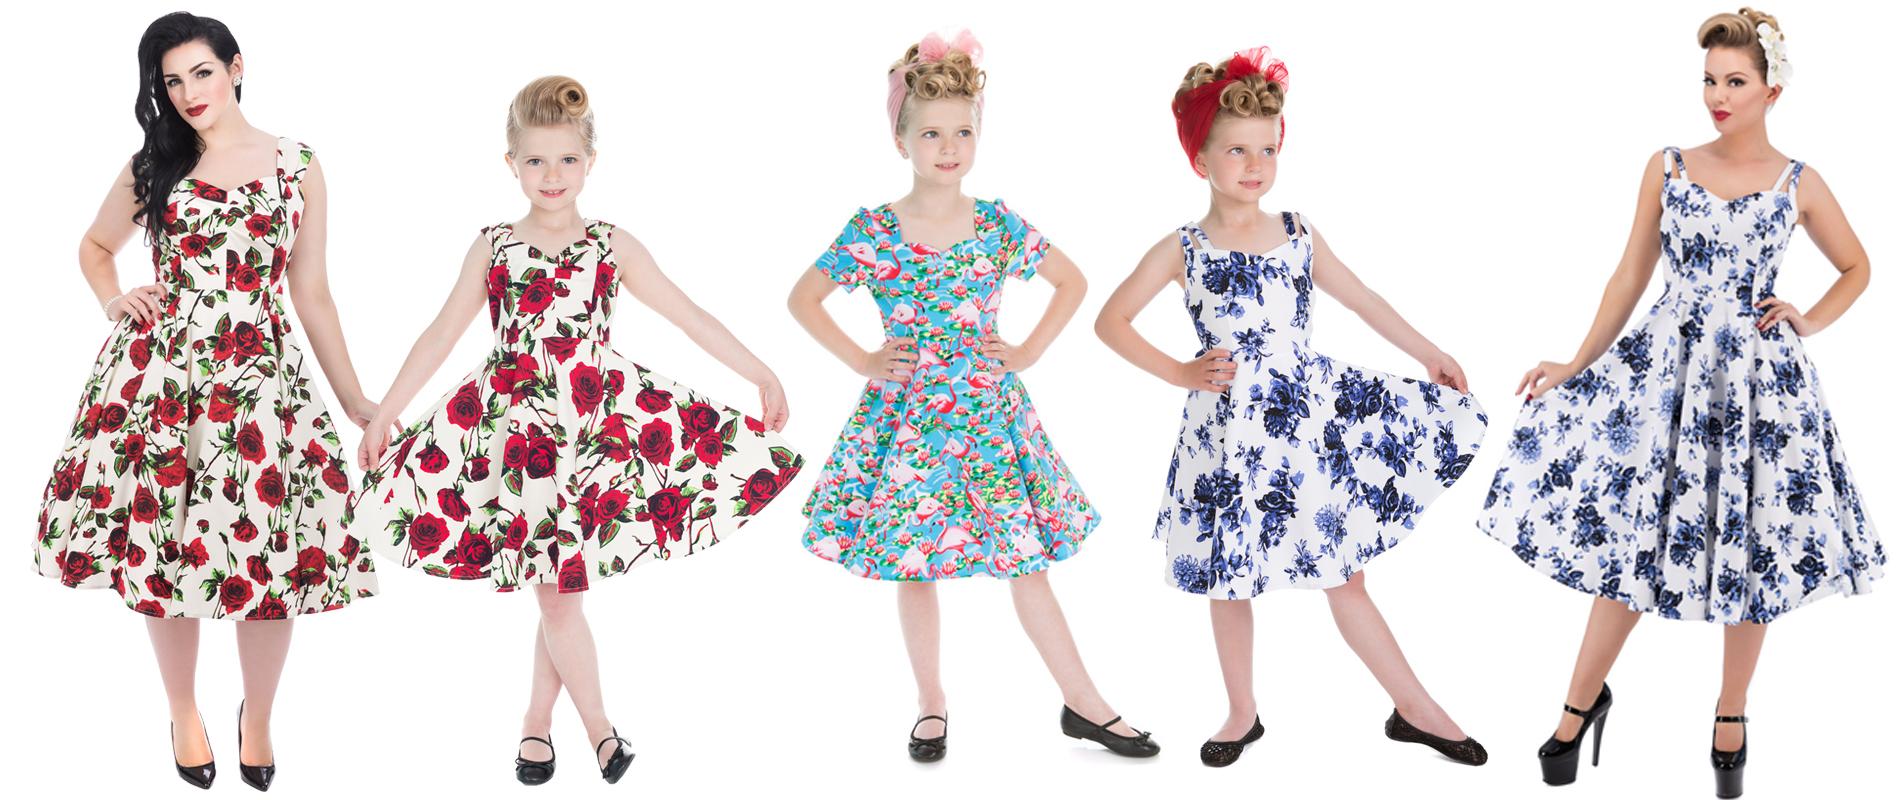 1cc215461e Cardigans. view collection. Dresses